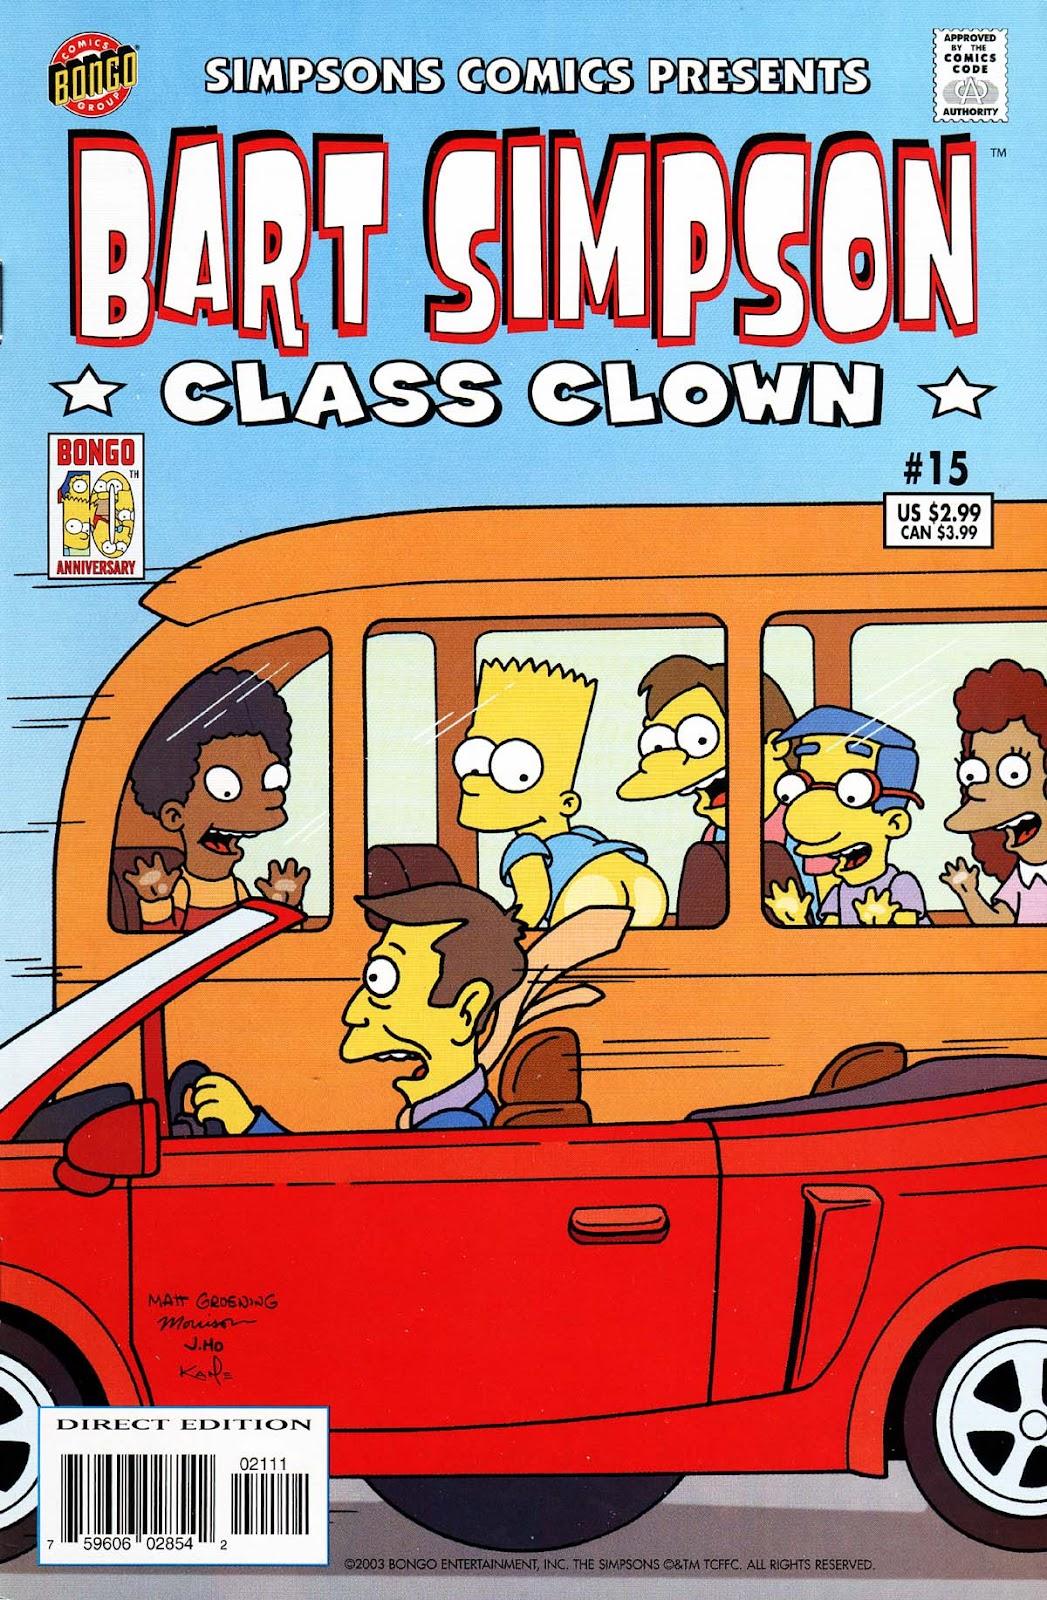 Simpsons Comics Presents Bart Simpson 15 Page 1